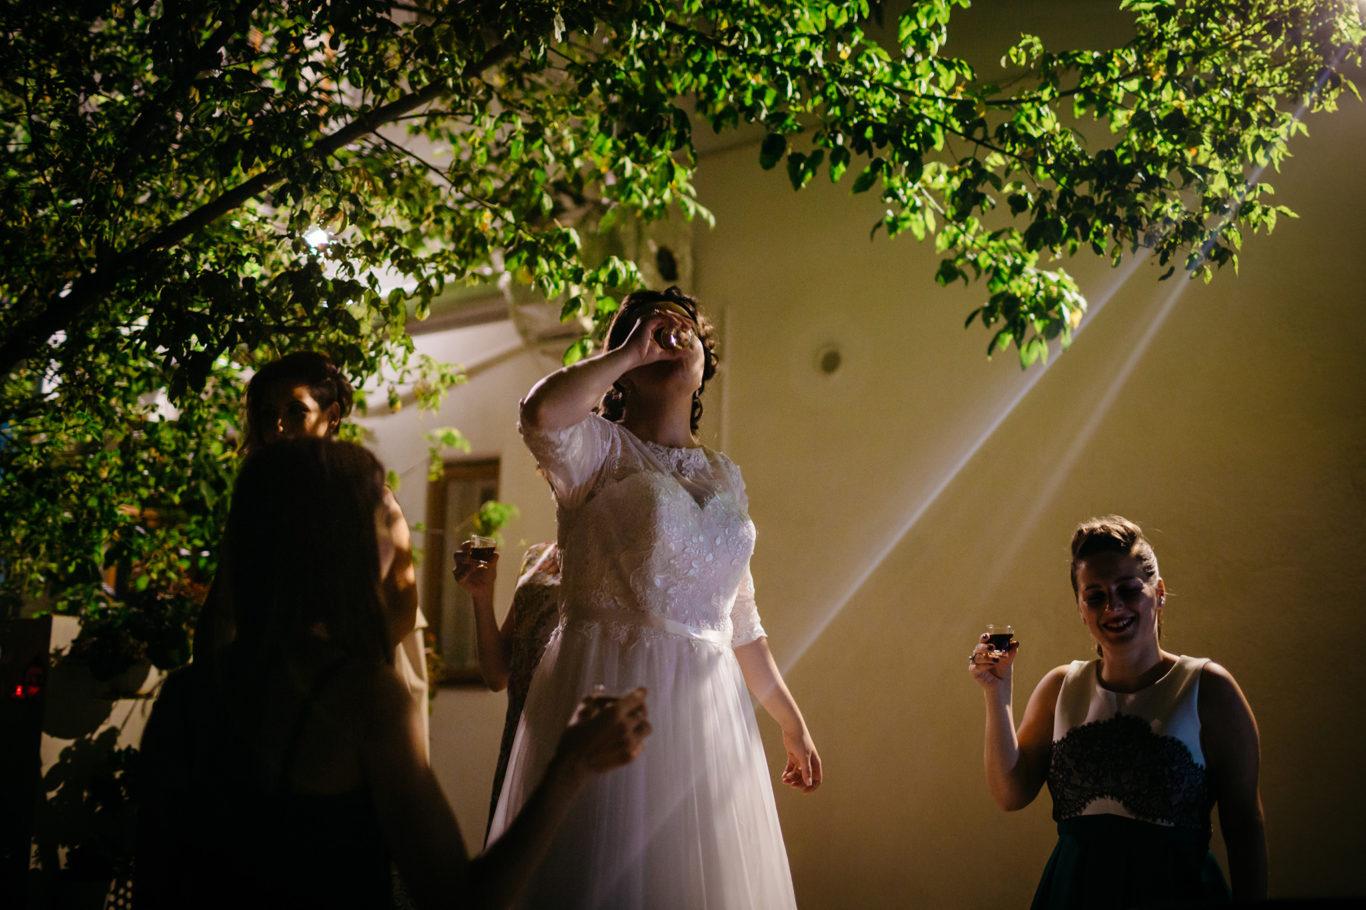 0703-fotografie-nunta-bucuresti-anca-george-fotograf-ciprian-dumitrescu-dcf_6045